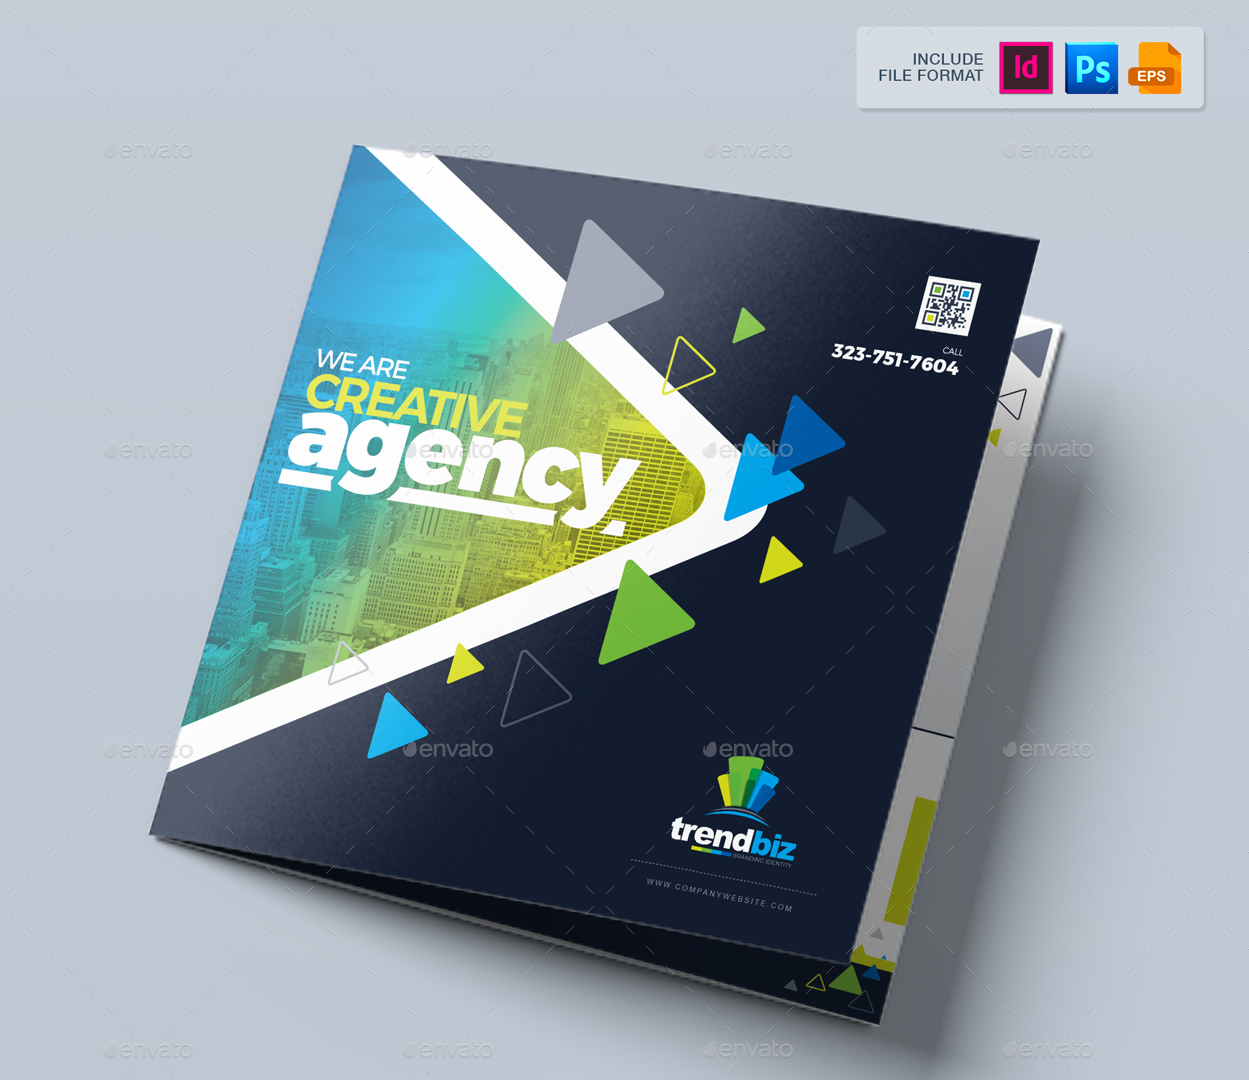 Tri Fold Brochure Template / Square Tri-Fold Brochure Design by ...